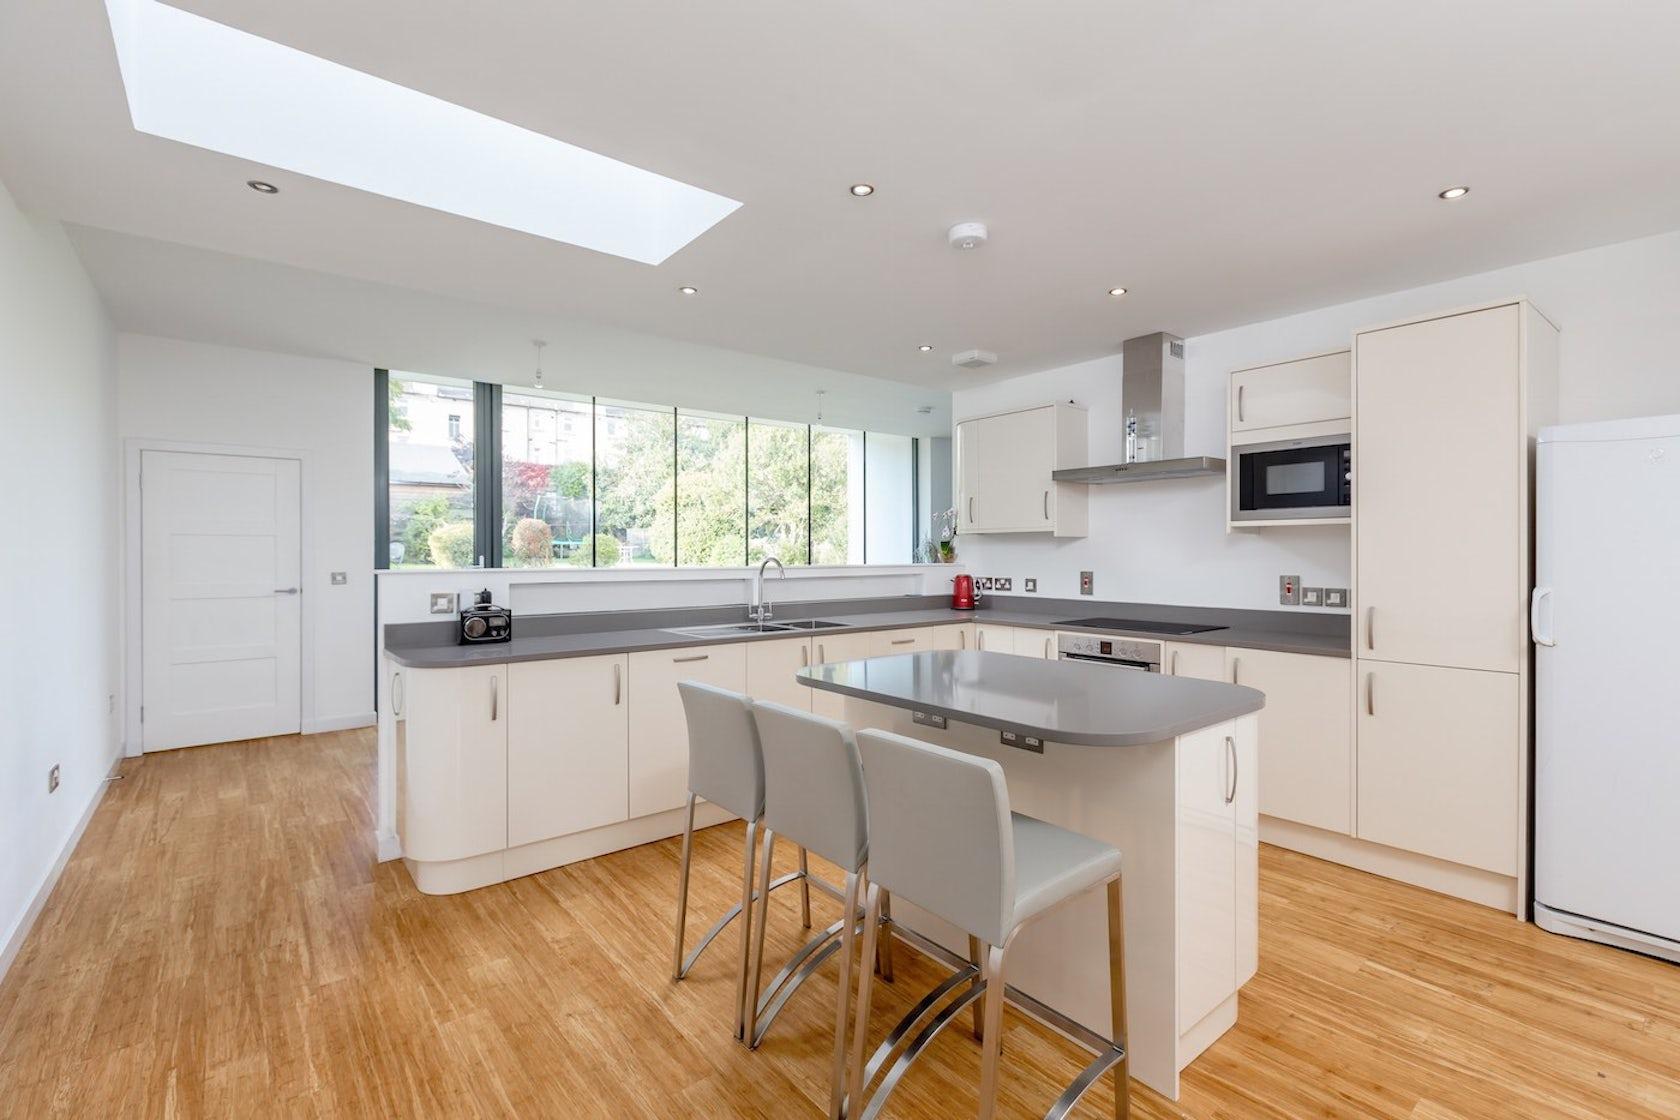 Contemporary house extension corstorphine edinburgh for Kitchen ideas edinburgh